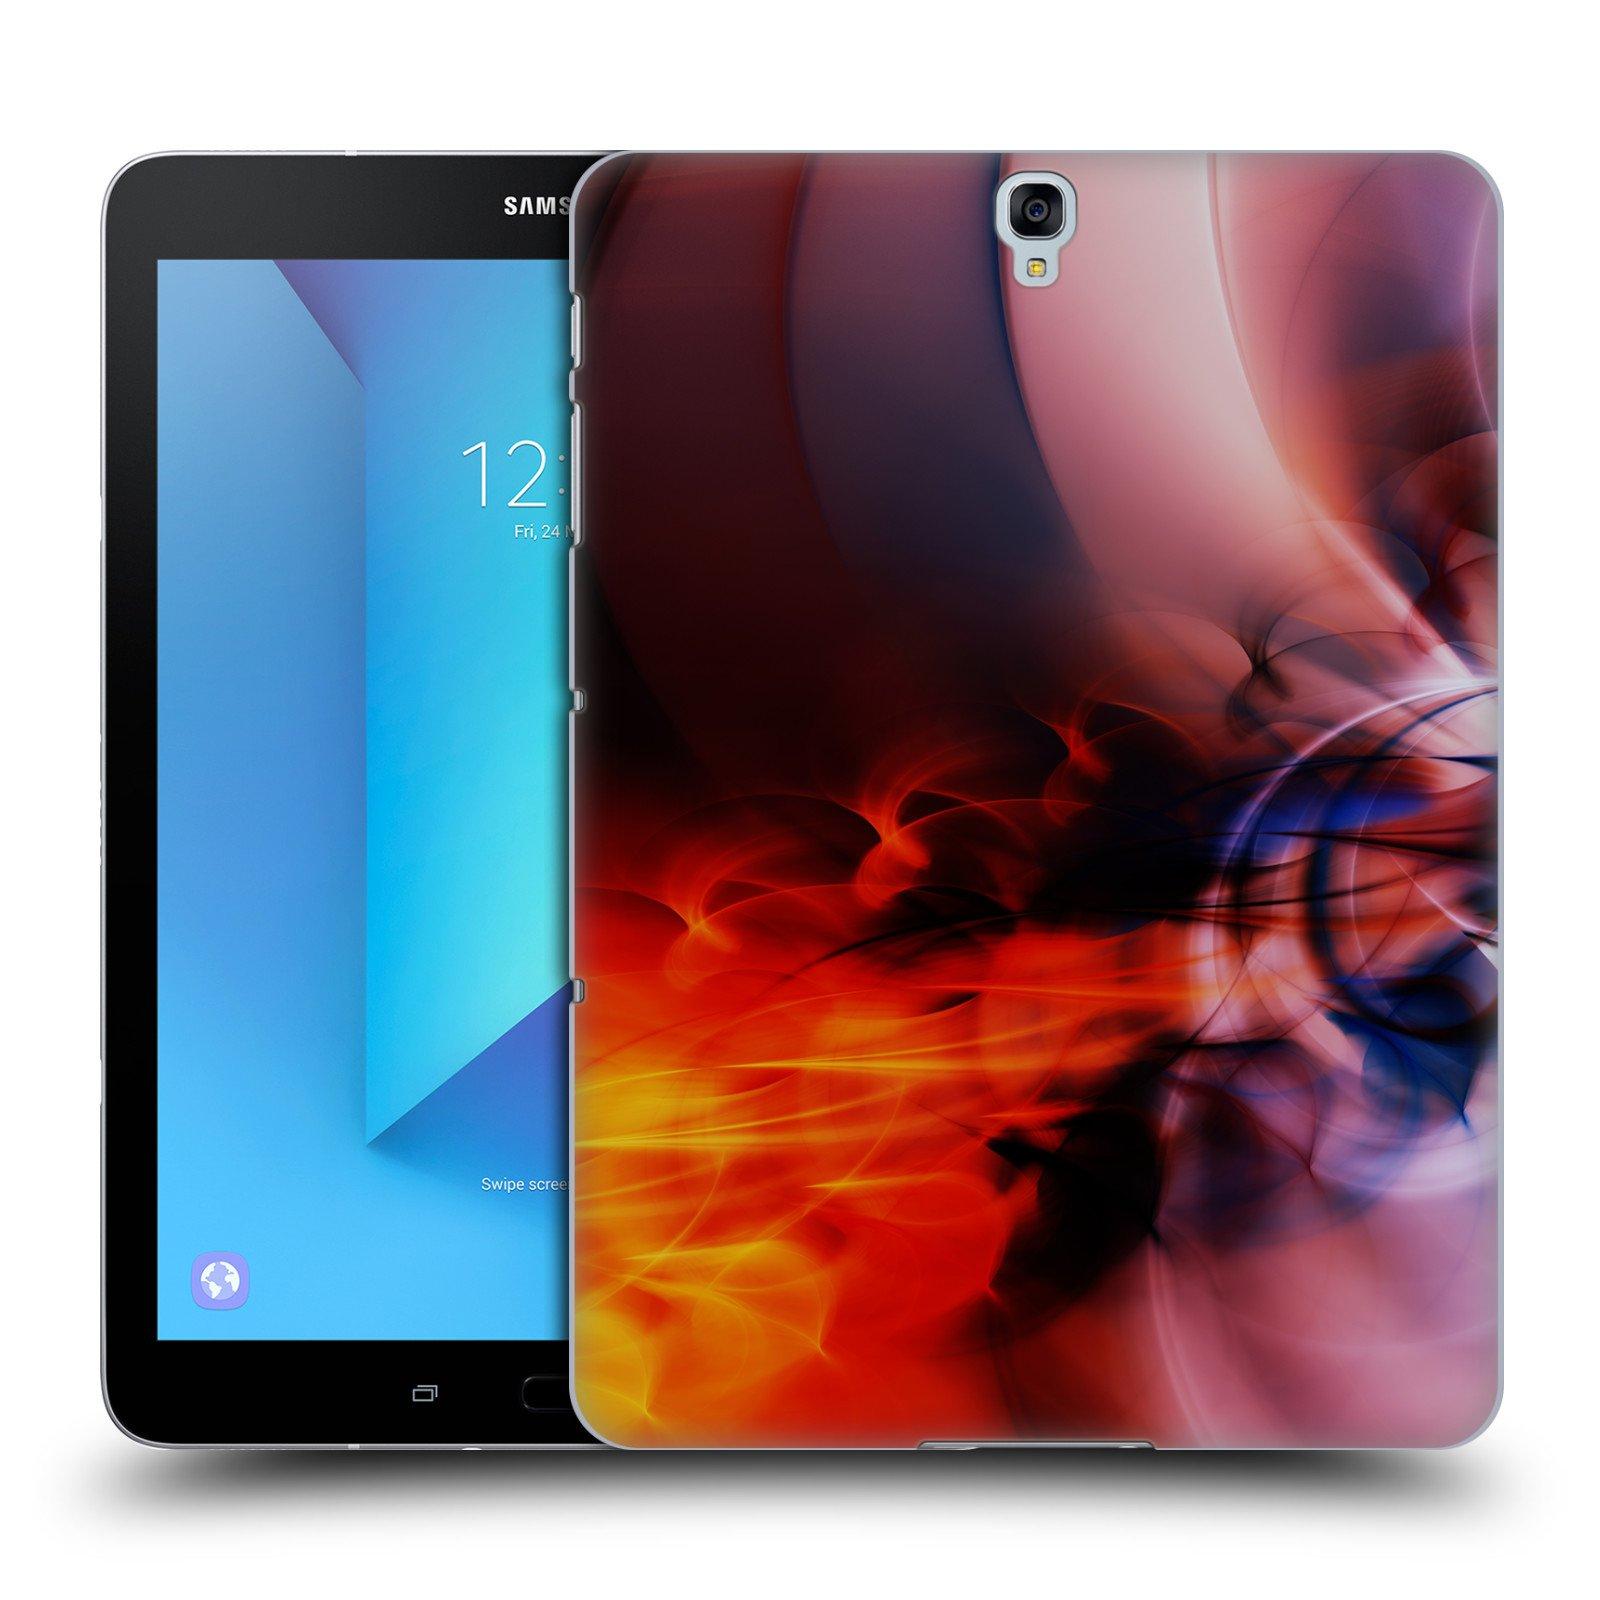 Official Andi GreyScale Blast Off Solar Flames Hard Back Case for Samsung Galaxy Tab S3 9.7